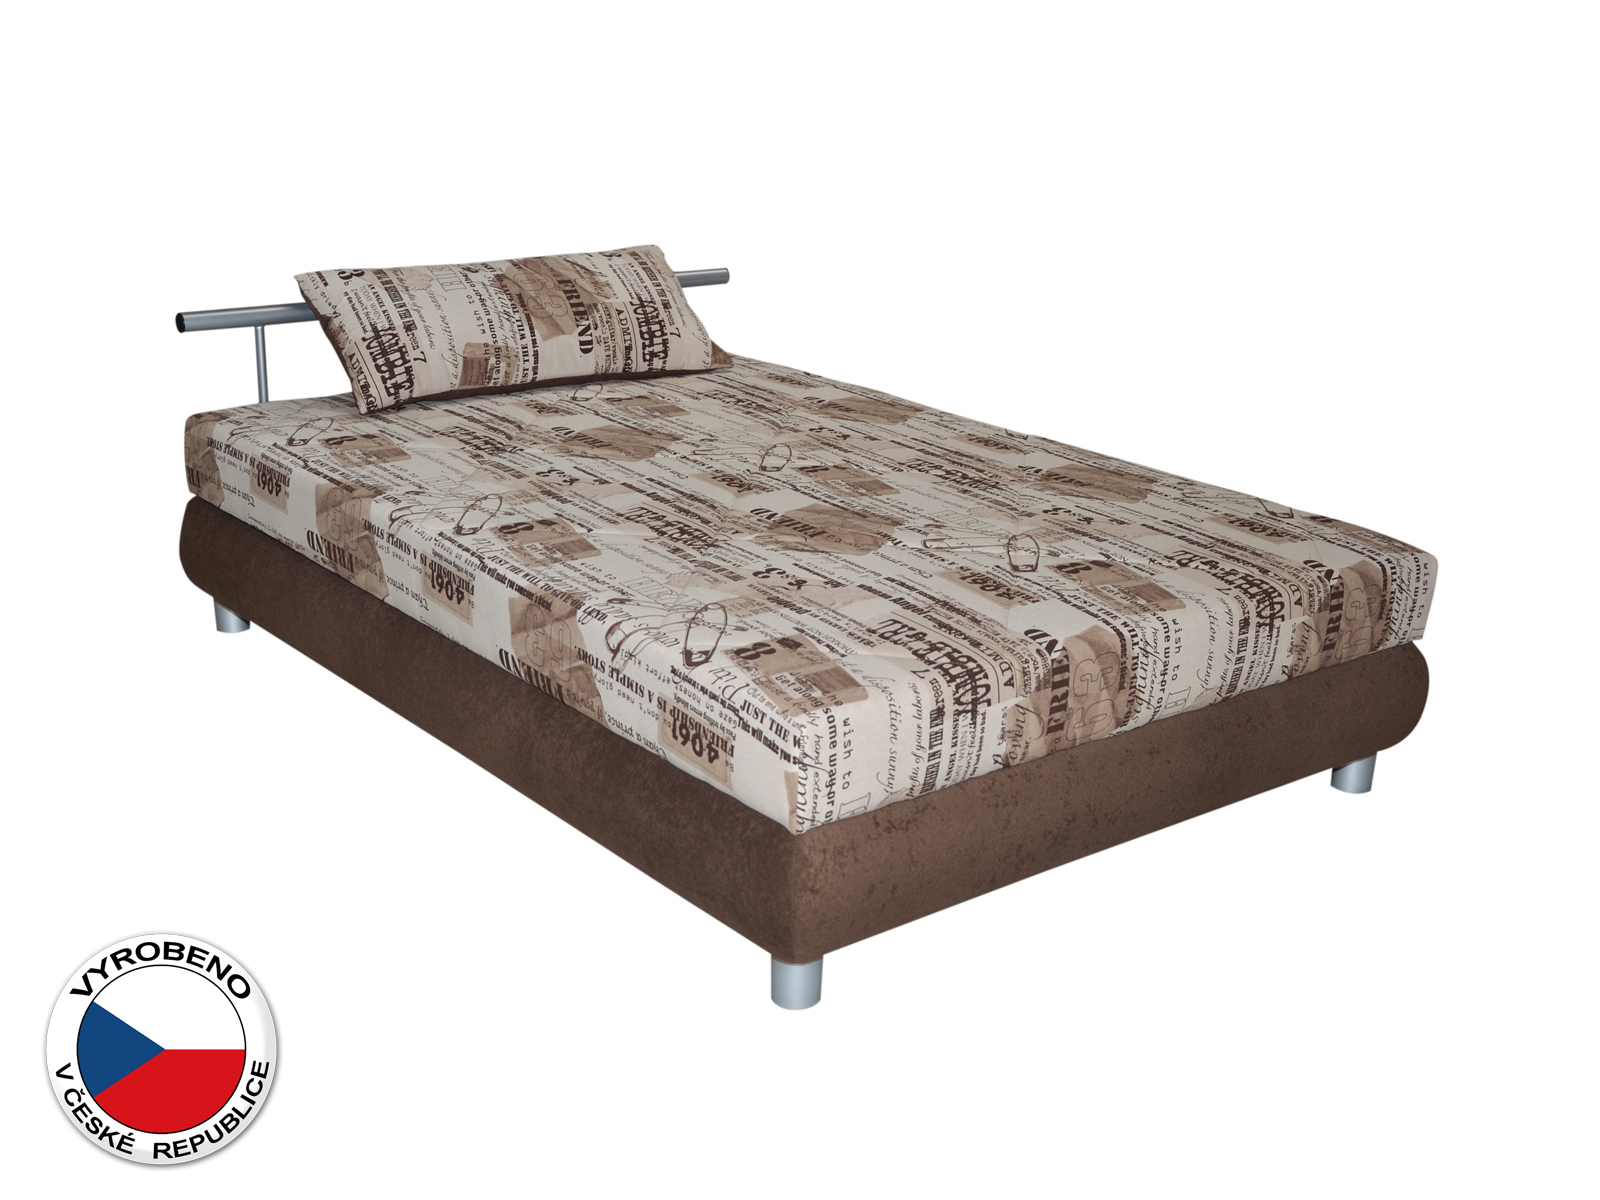 Manželská postel 140 cm - Blanár - Adriana (vzor Sevila 24-40 + hnědá) (s roštem a matrací)